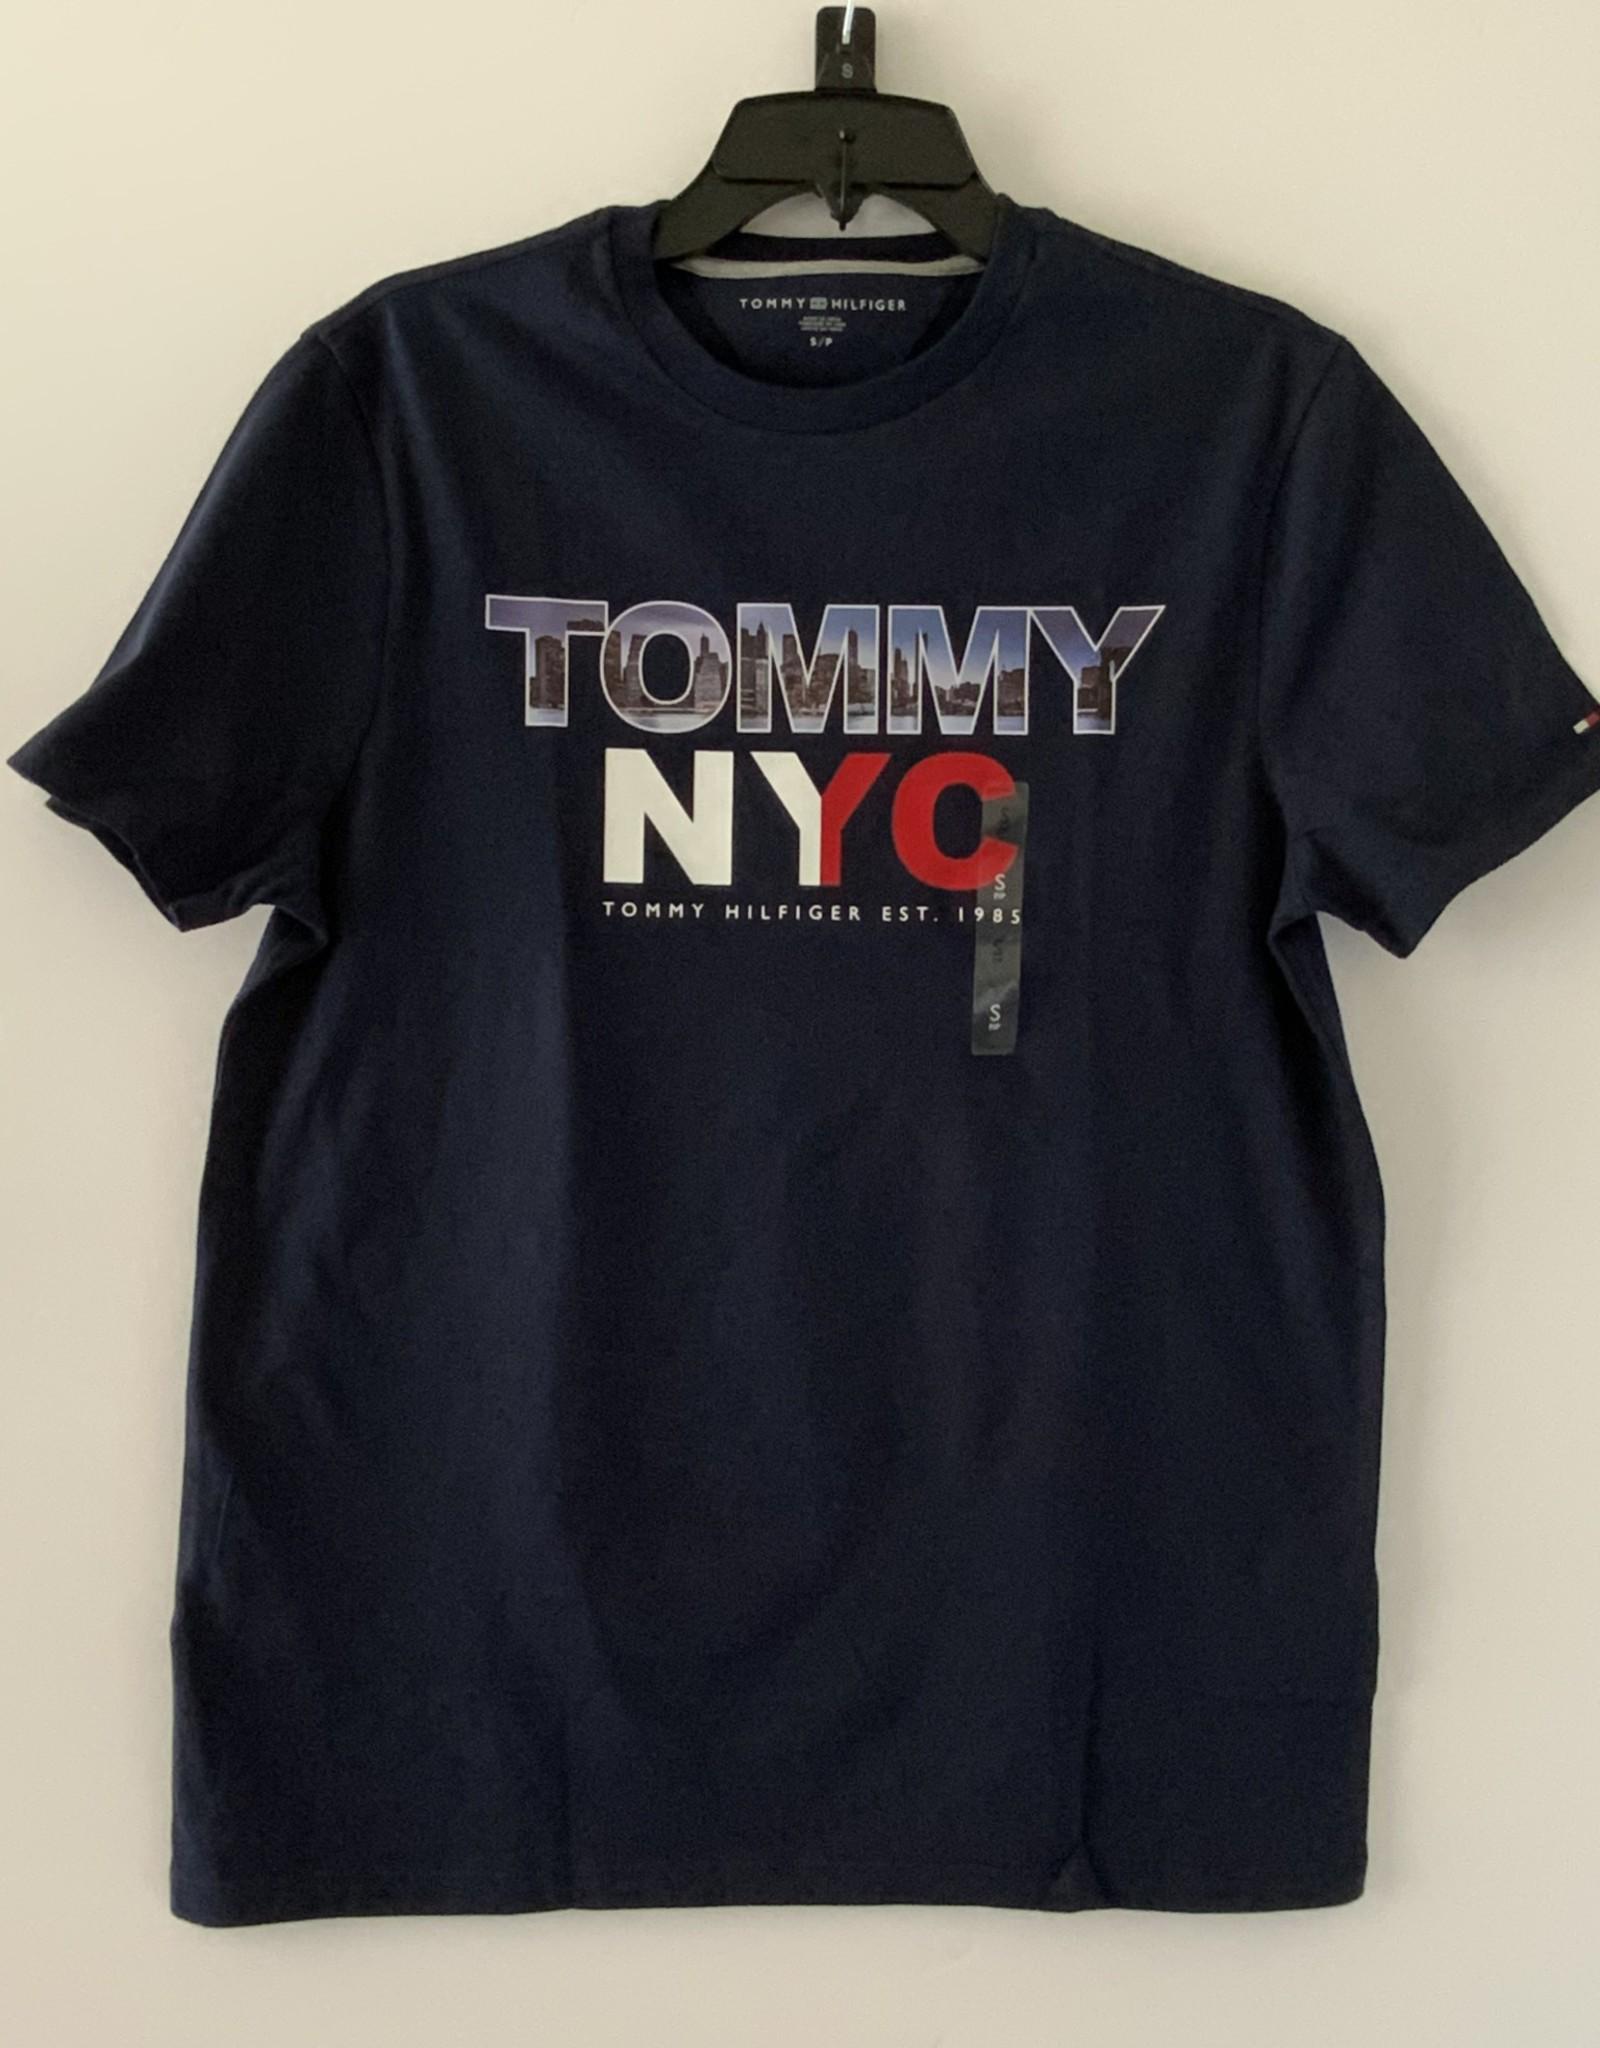 Tommy Hilfiger Tommy Hilfiger Tee